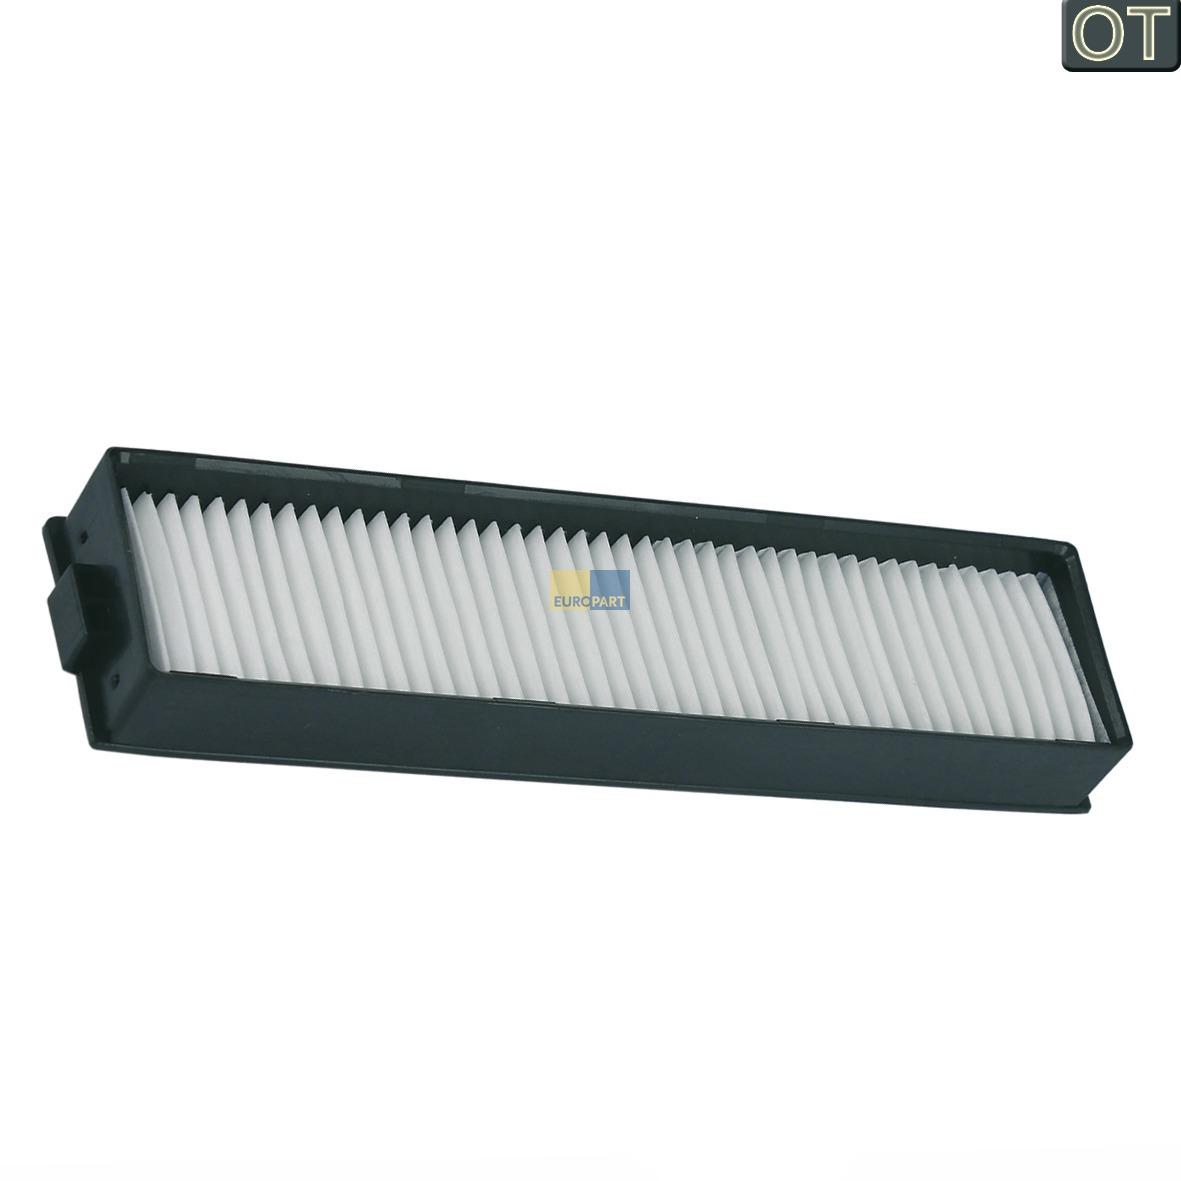 VR6260LV.BAEQLGD Luftfilter für LG Saugroboter Hom-Bot VR62601LV.BAEQEEU